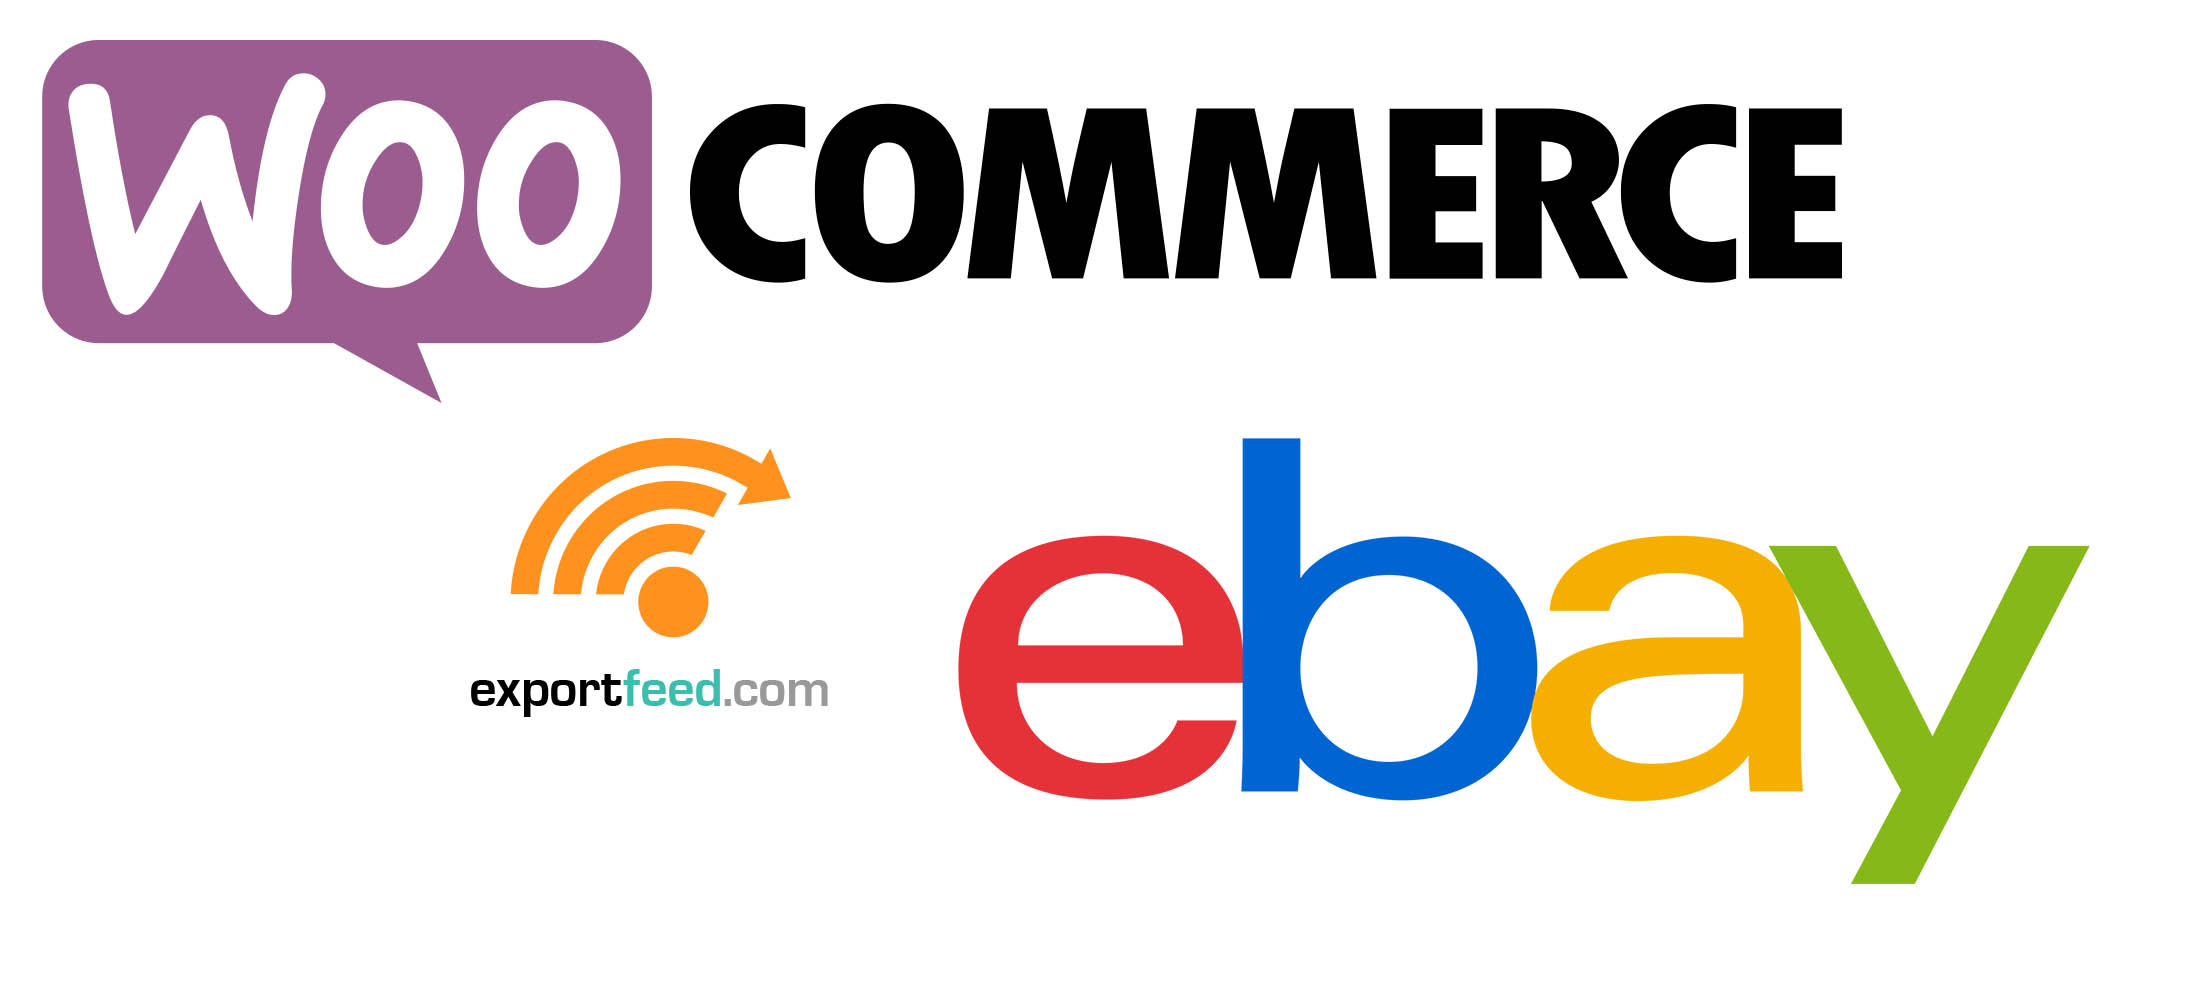 woocommerce feed export to ebay